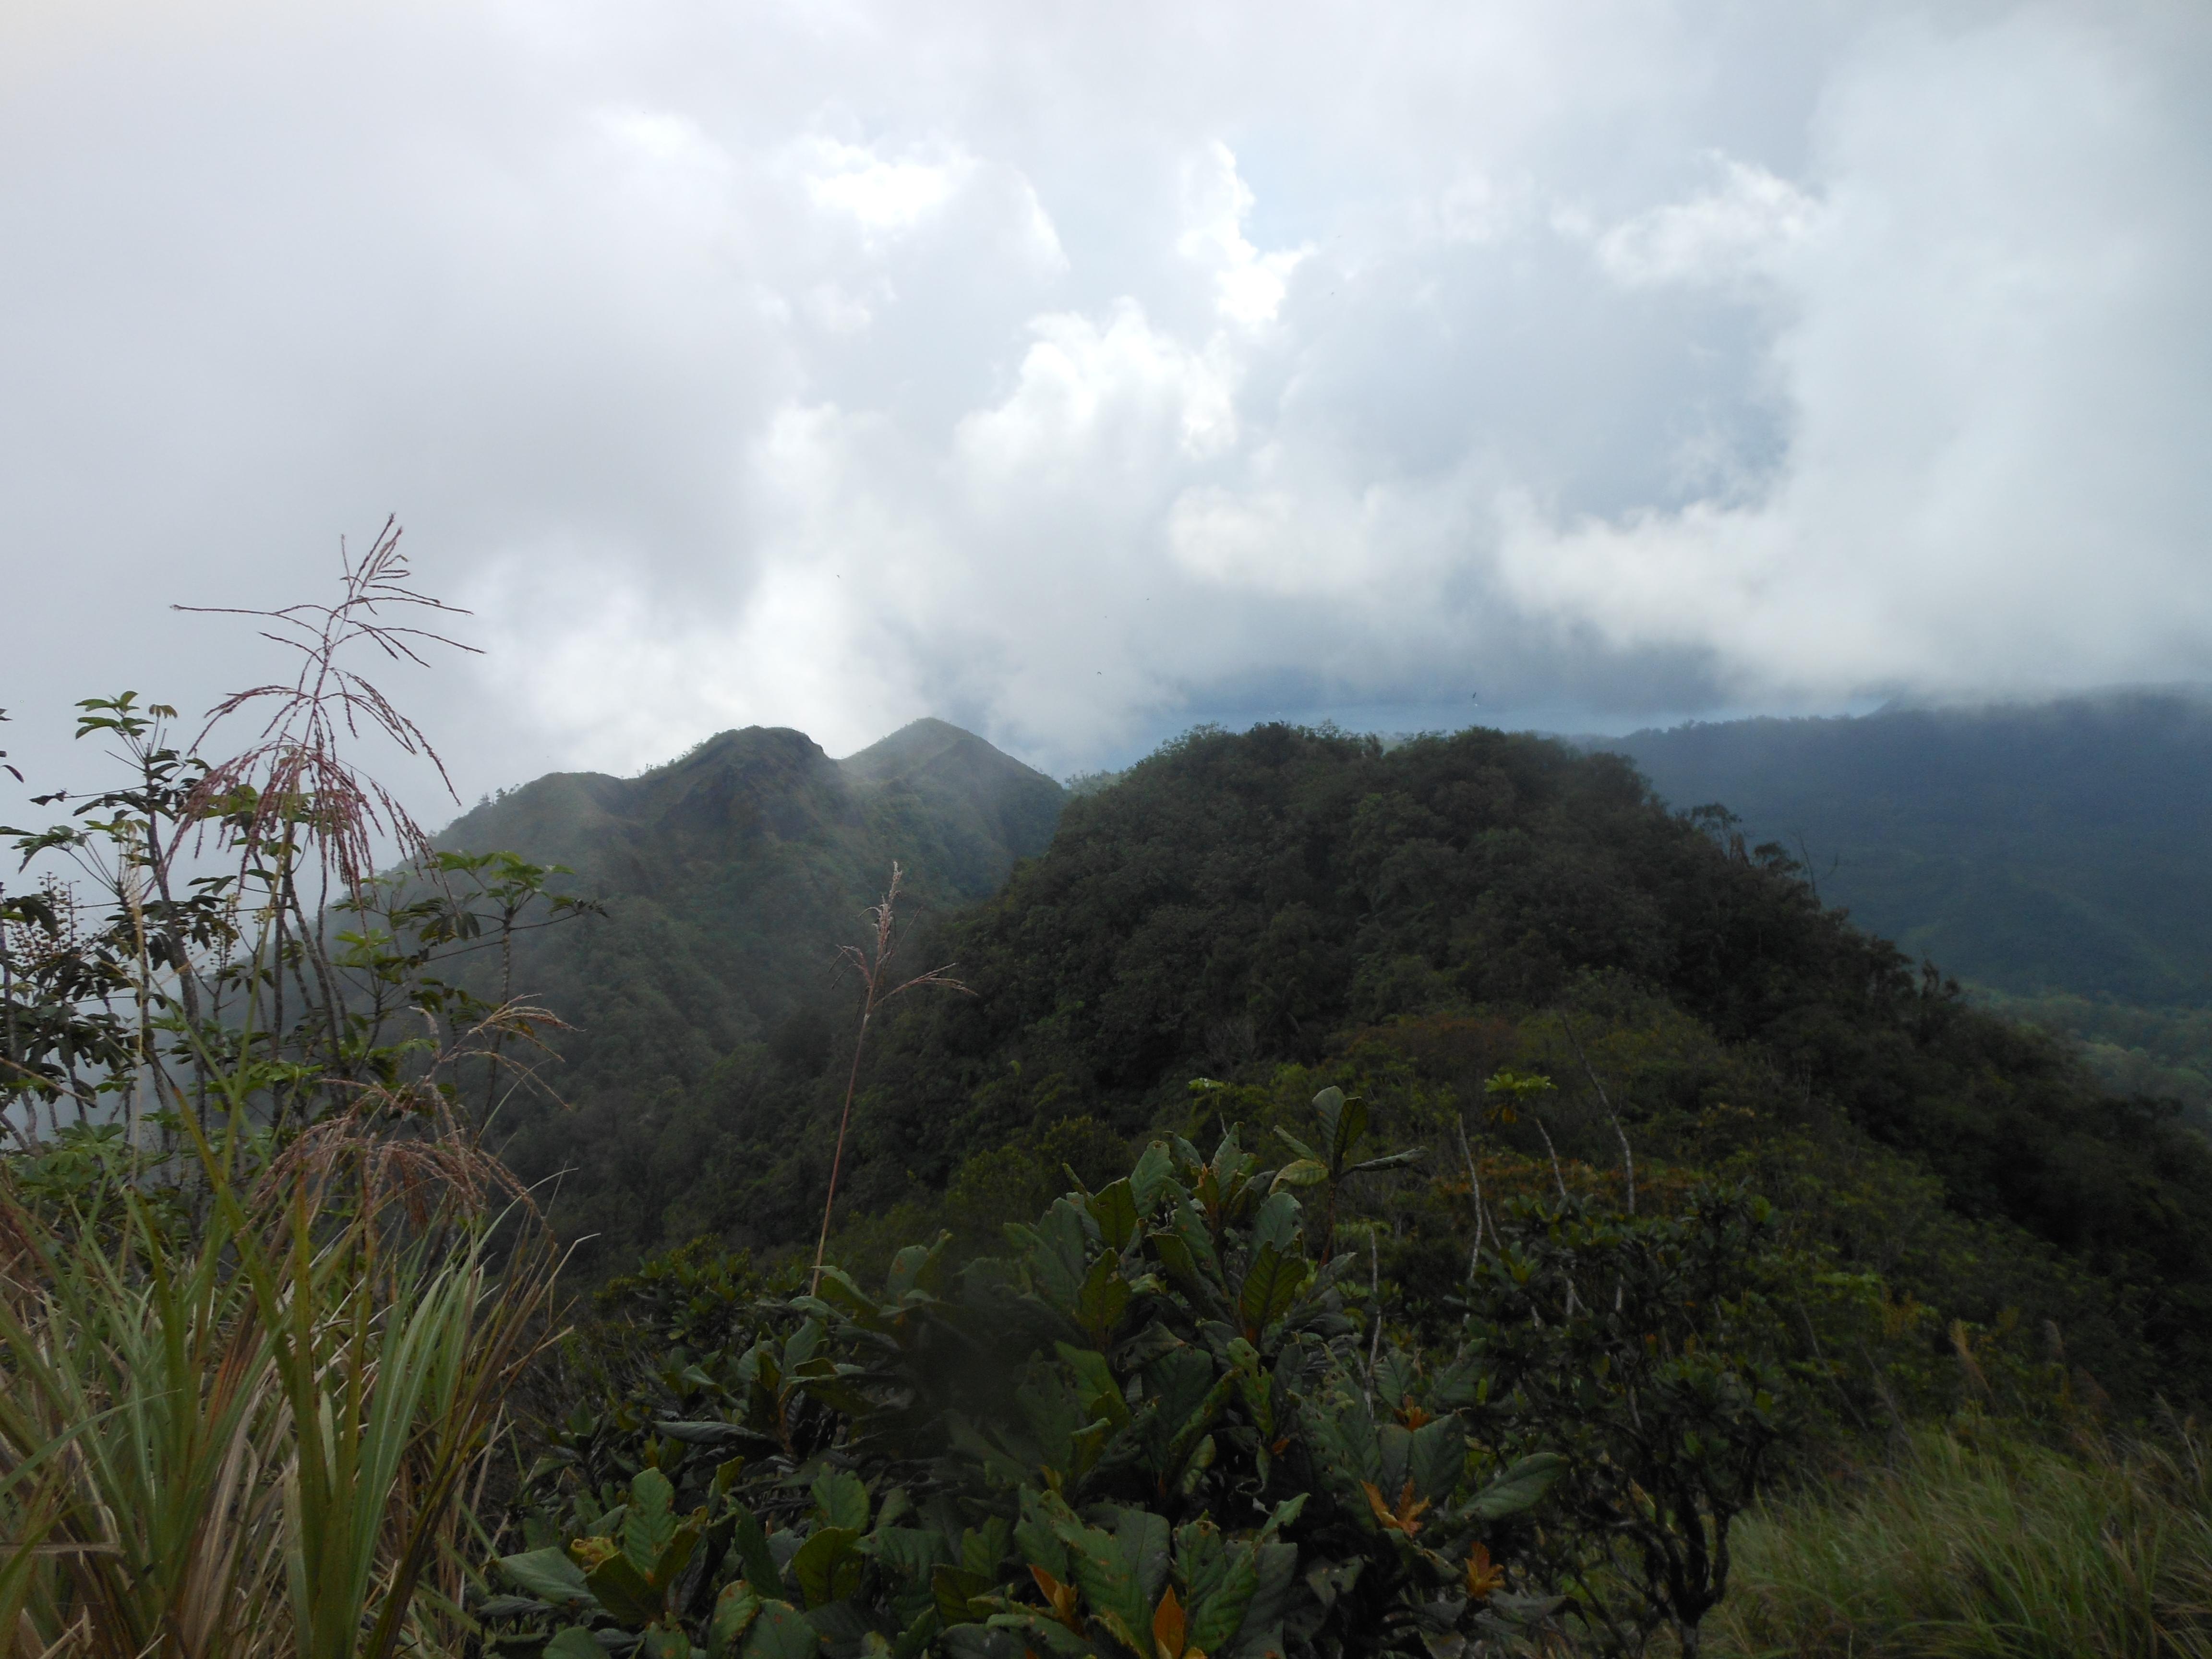 Gunung Dua Saudara Bagging Tomohon Bunaken Tangkoko 311 Duasaudara Kota